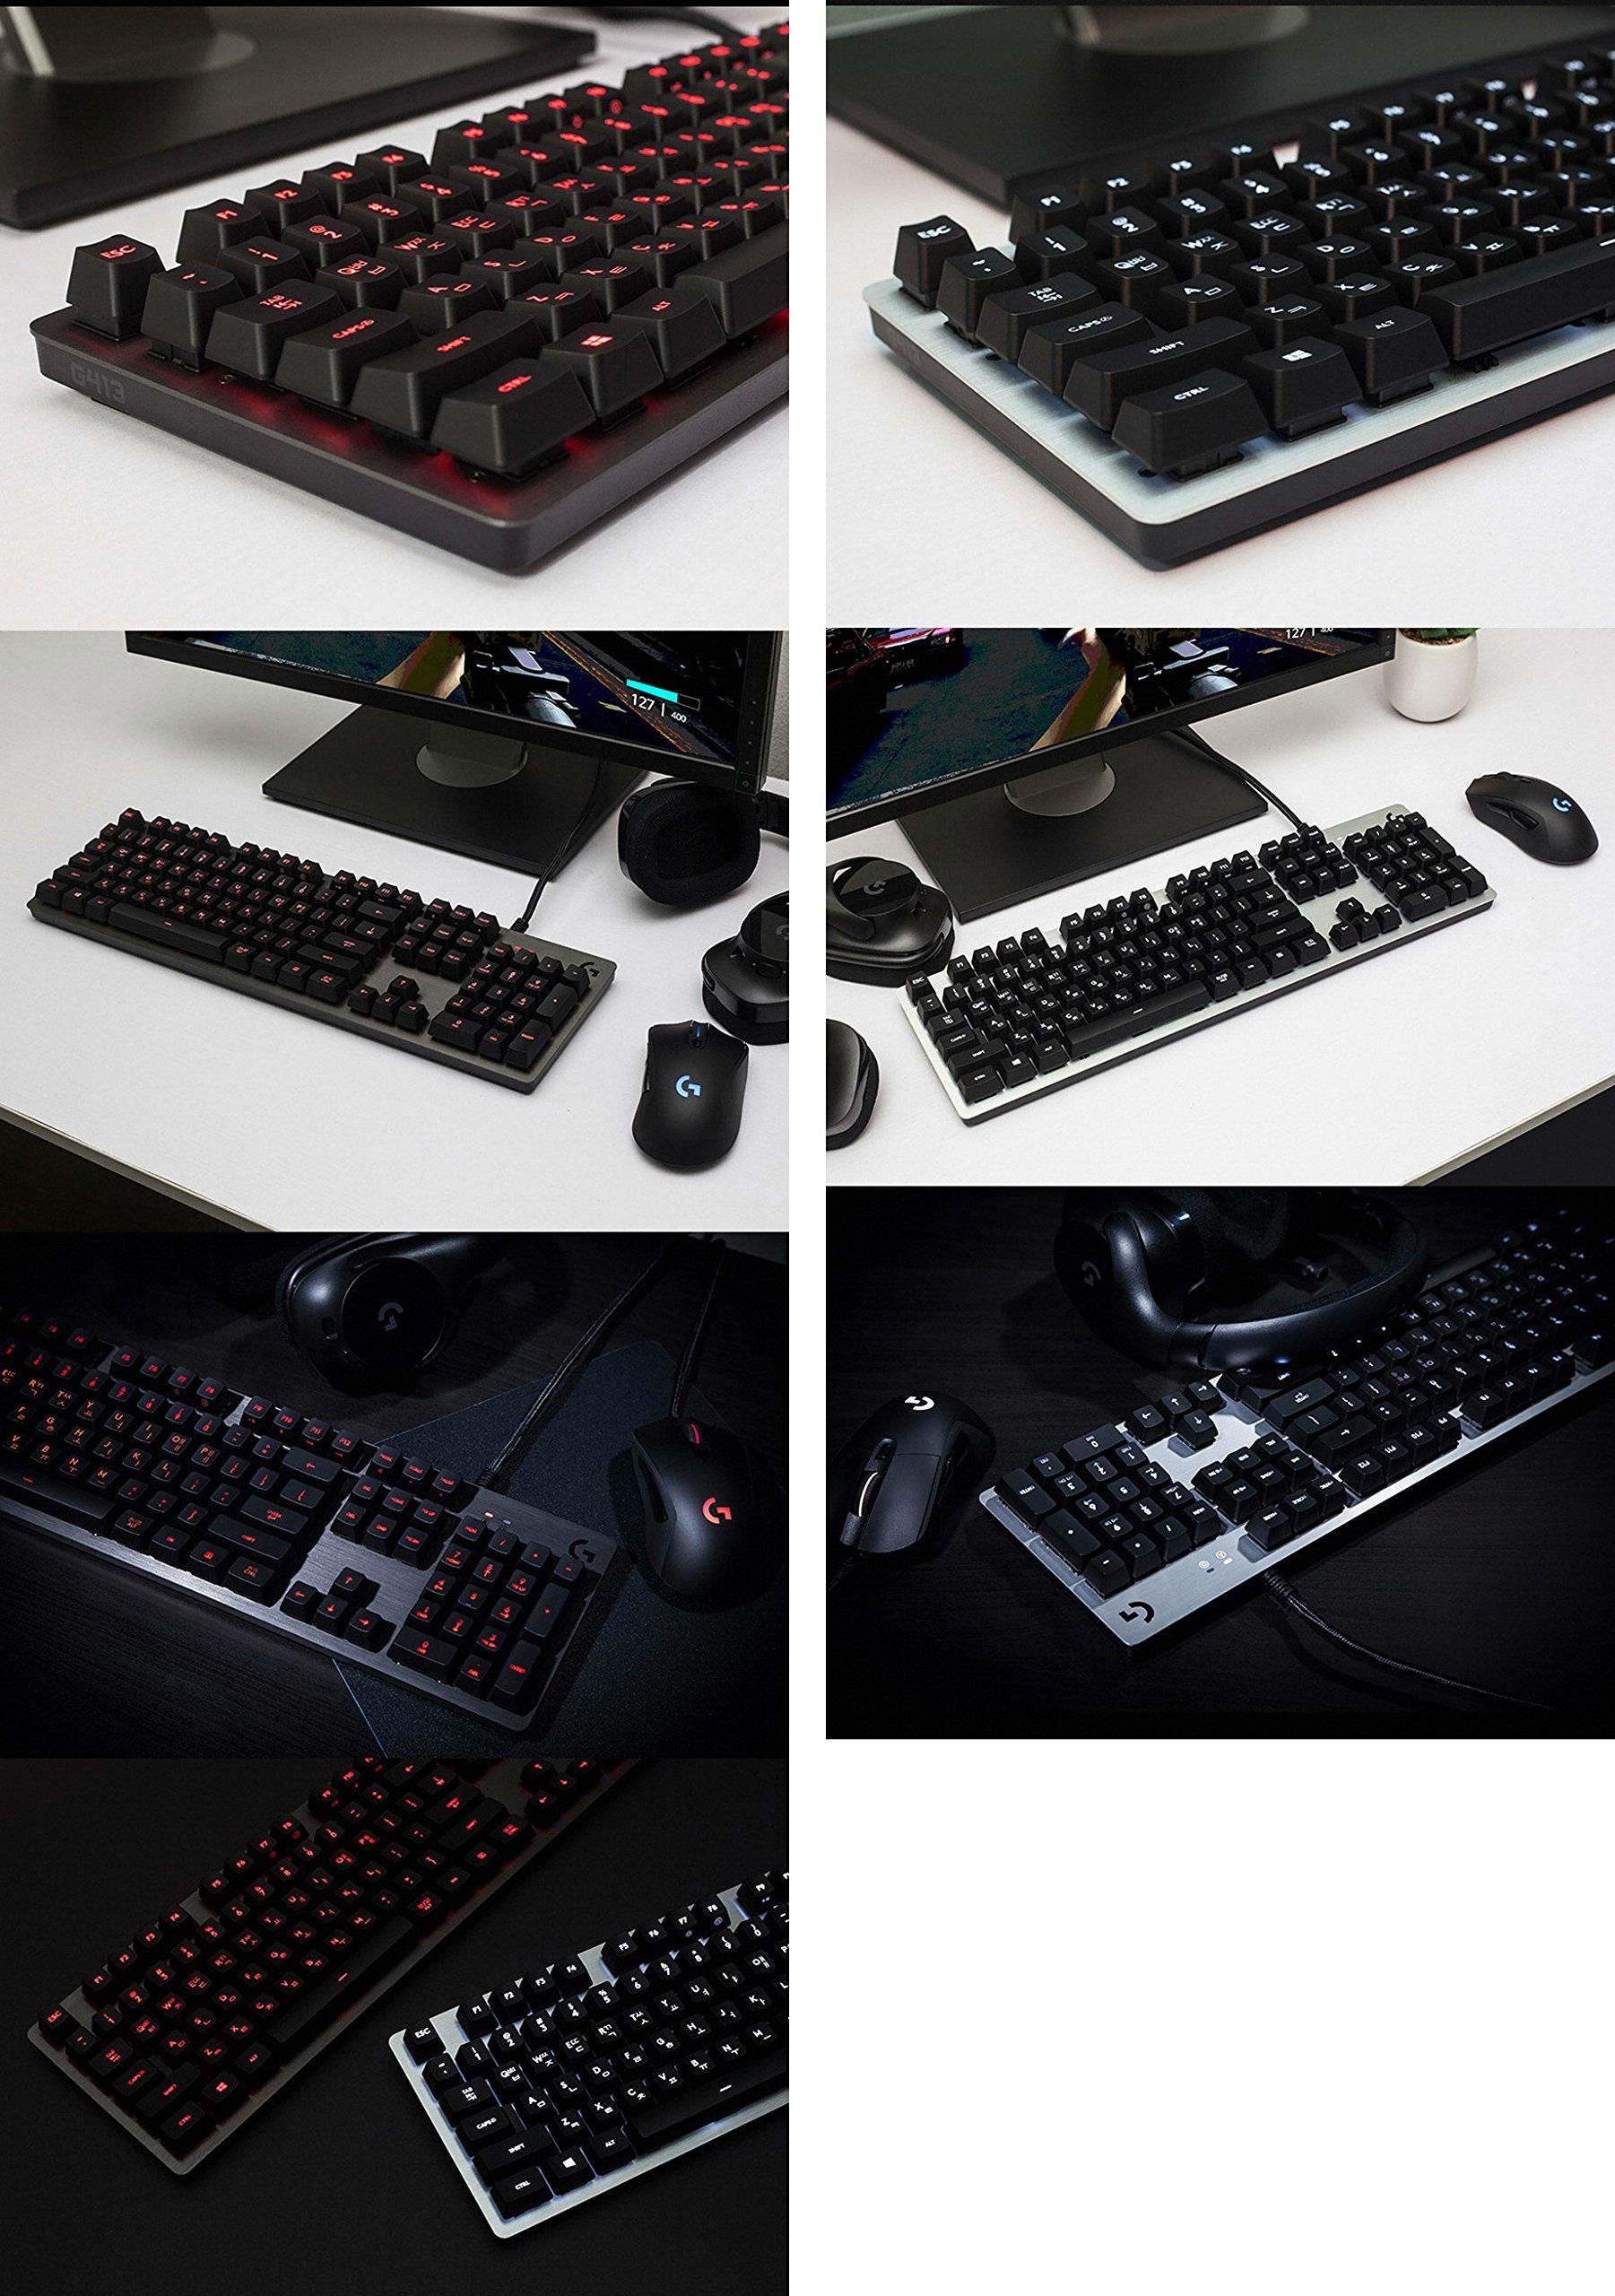 Logitech G413 Backlit Aluminum Mechanical Gaming Keyboard with USB Passthrough -International Version- EN/KR Layout (Silver)